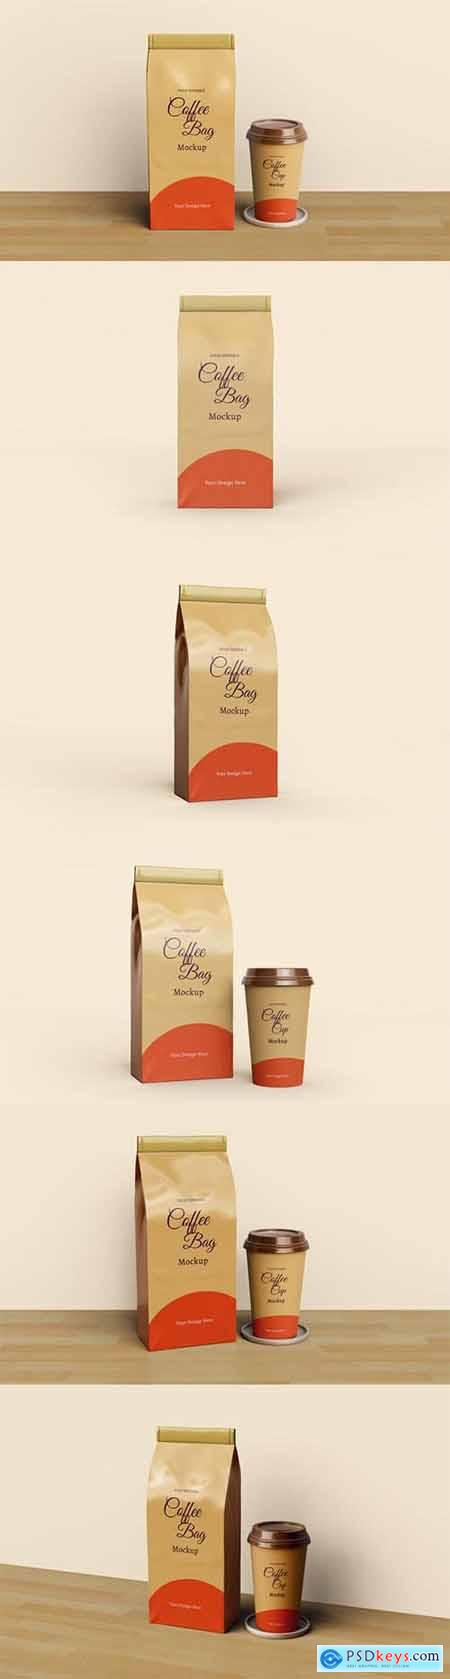 Coffee bag and coffee cup packaging mockup